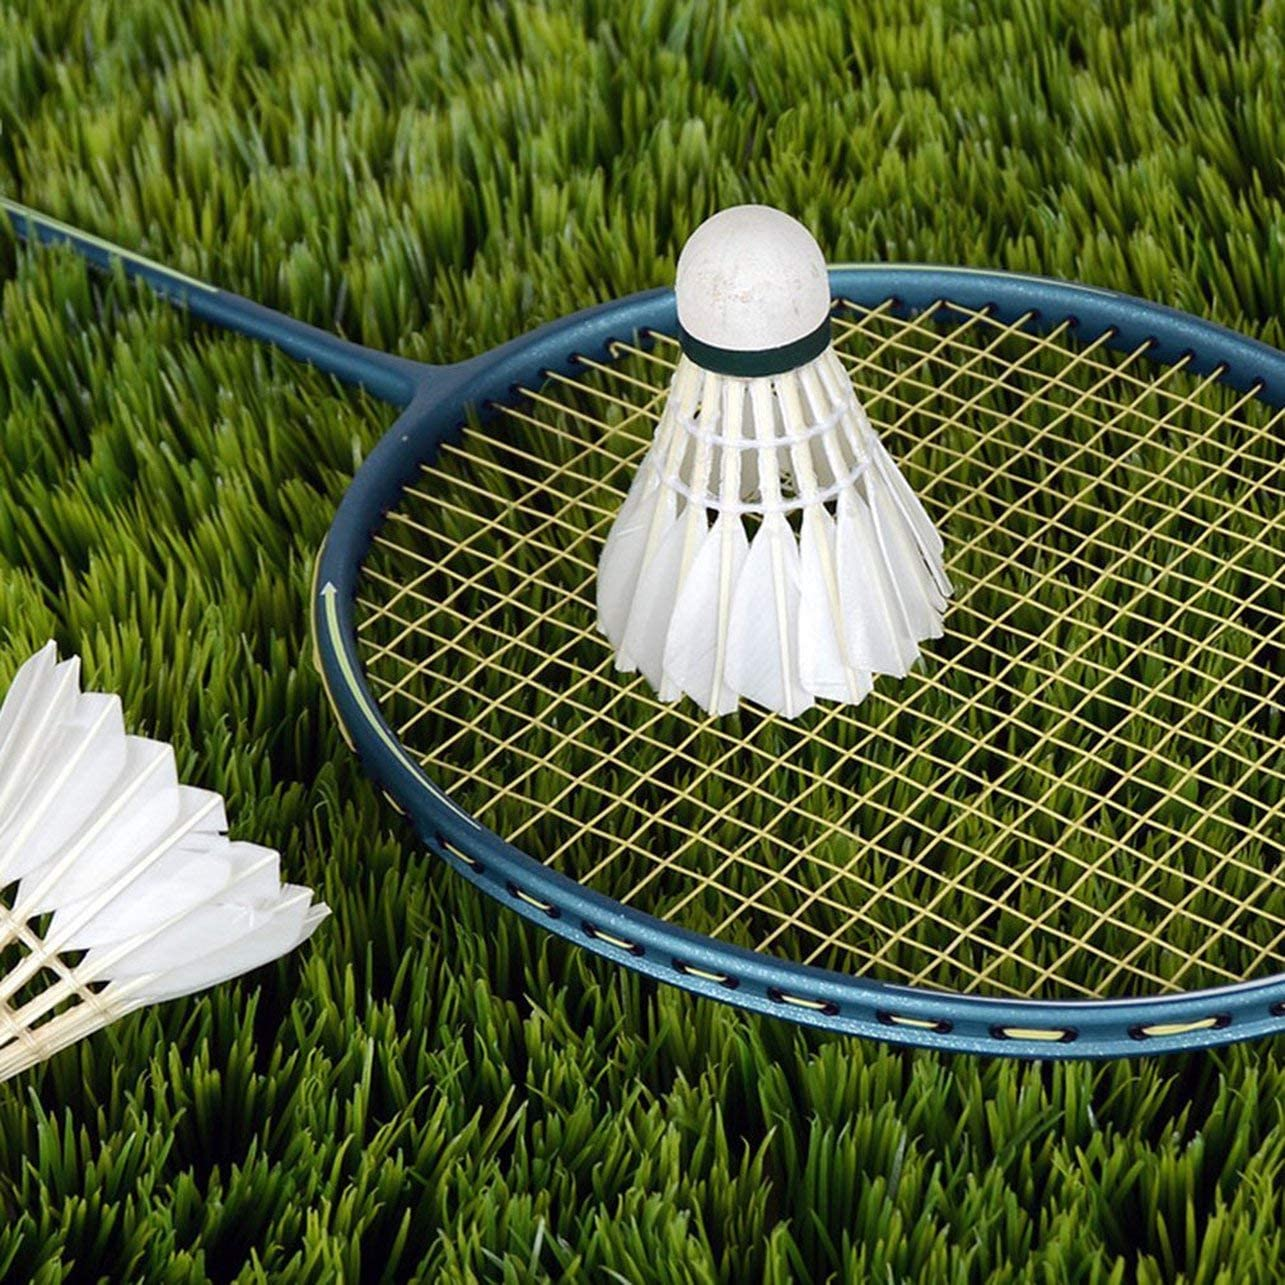 WOSOSYEYO 3 x Entra/înement Plumes de Canard Blanches Volants de Badminton Birdies Ball Game Jeu de Divertissement Sportif Balles de Badminton avec bidon